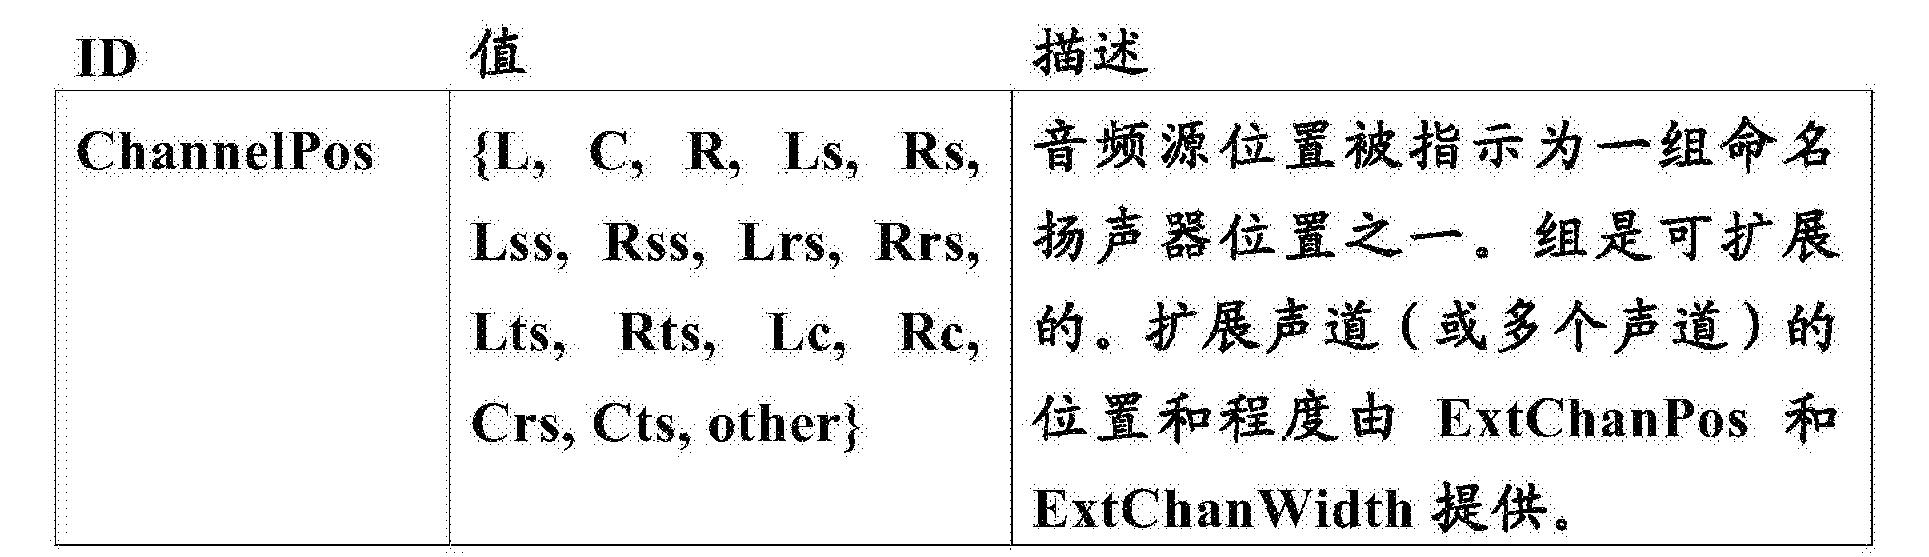 Figure CN105792086AD00272